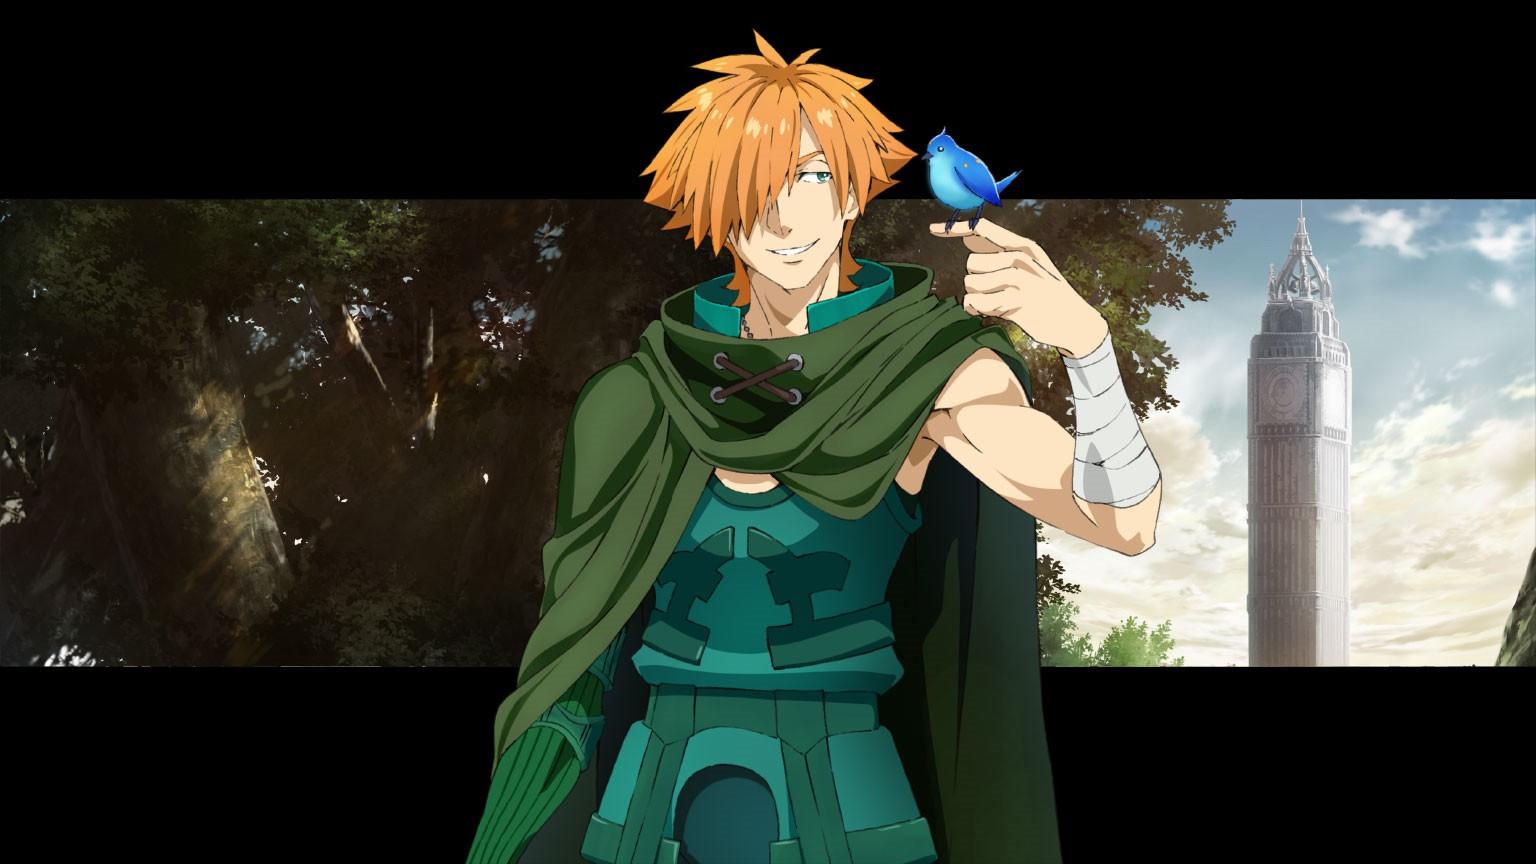 Fate/EXTRA,尼禄壁纸特辑,尼禄本子,尼禄H